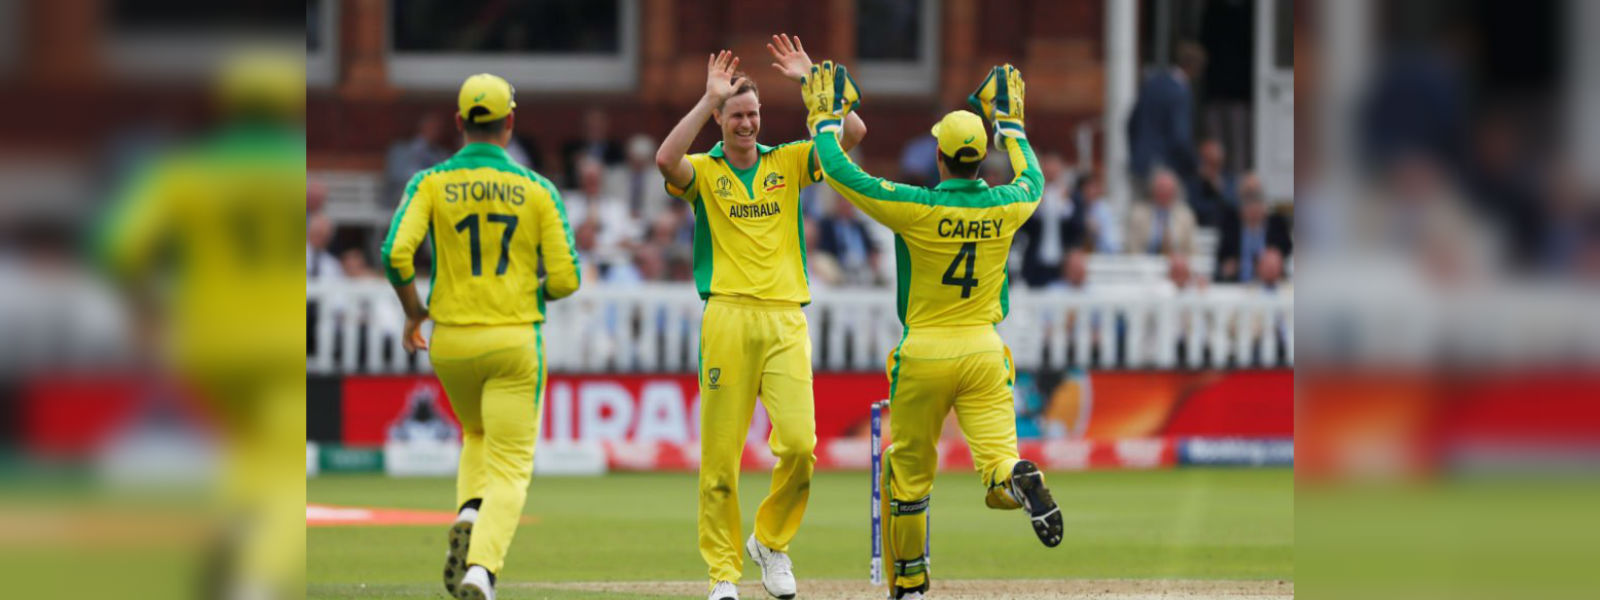 Clinical Australia outclasses England to reach semis